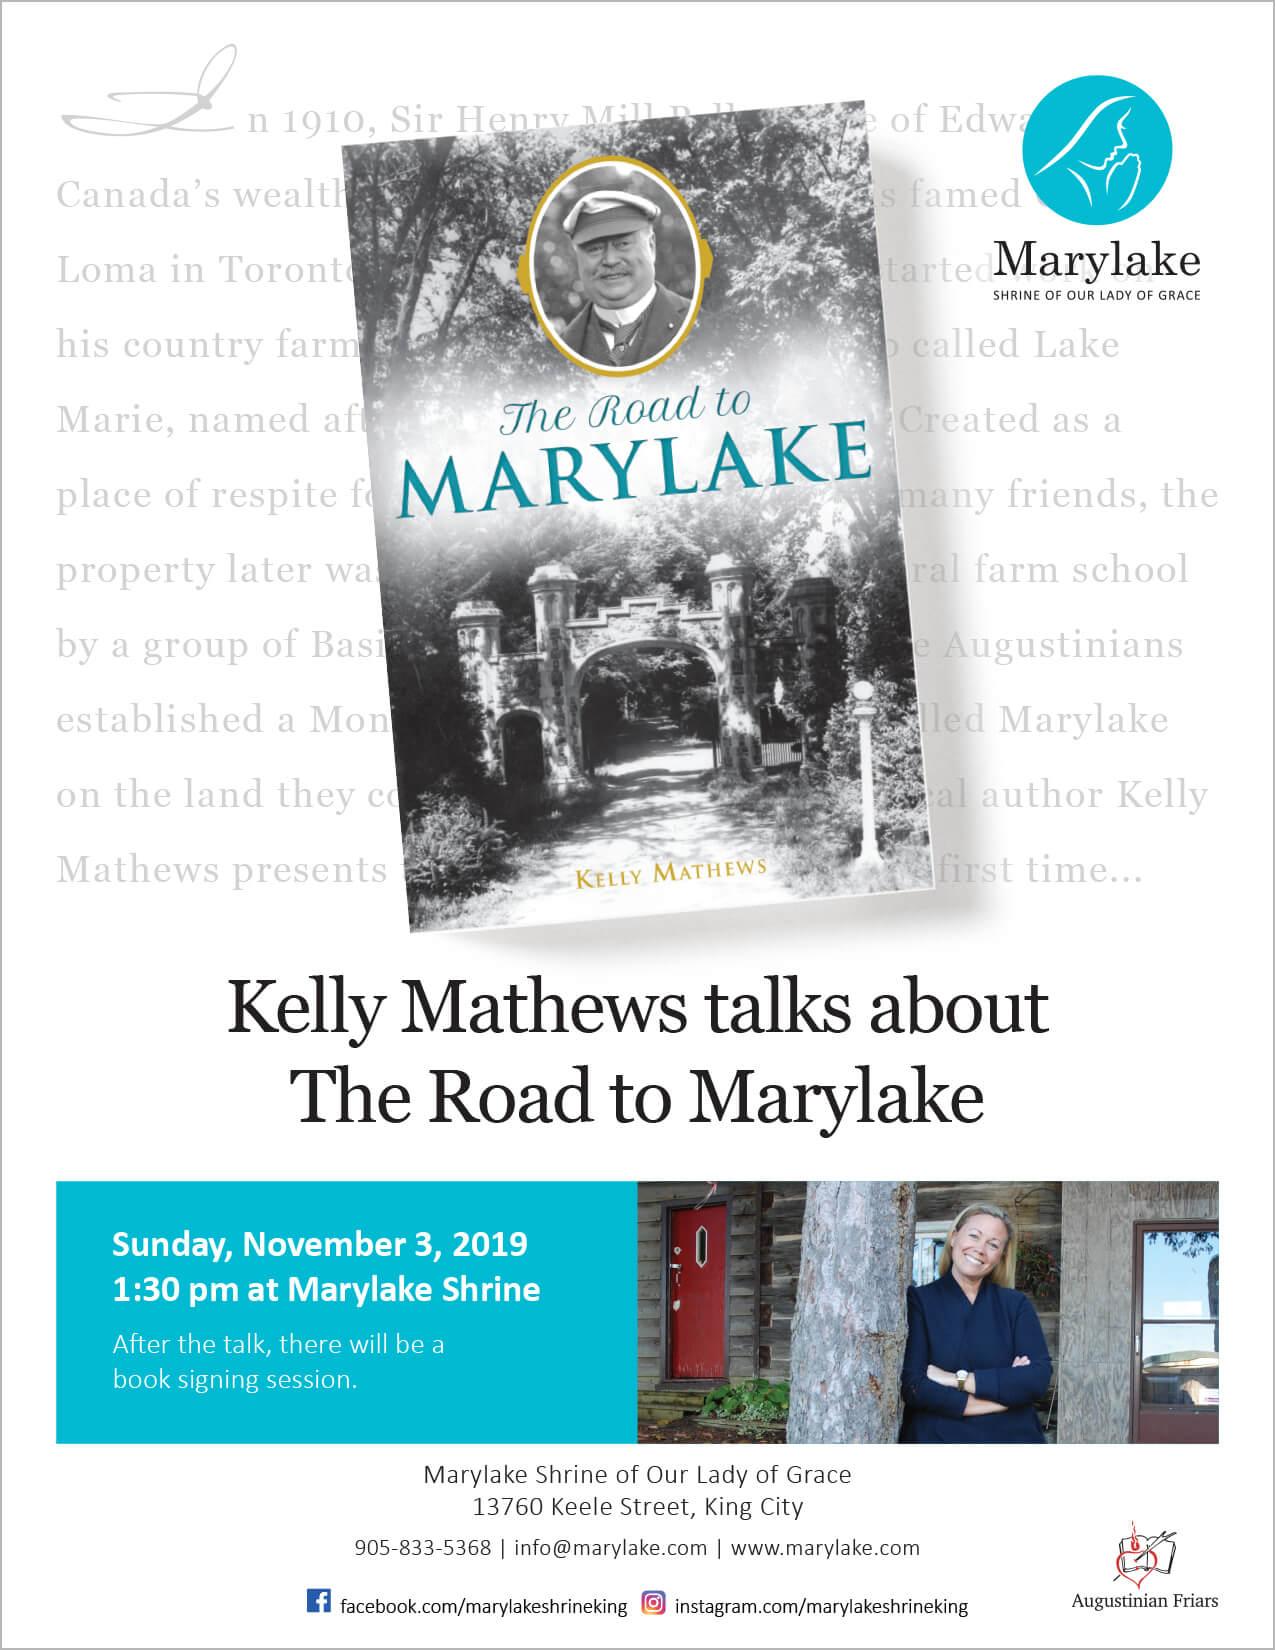 2019_marylake_road_to_marylake_8.5x11.jpg